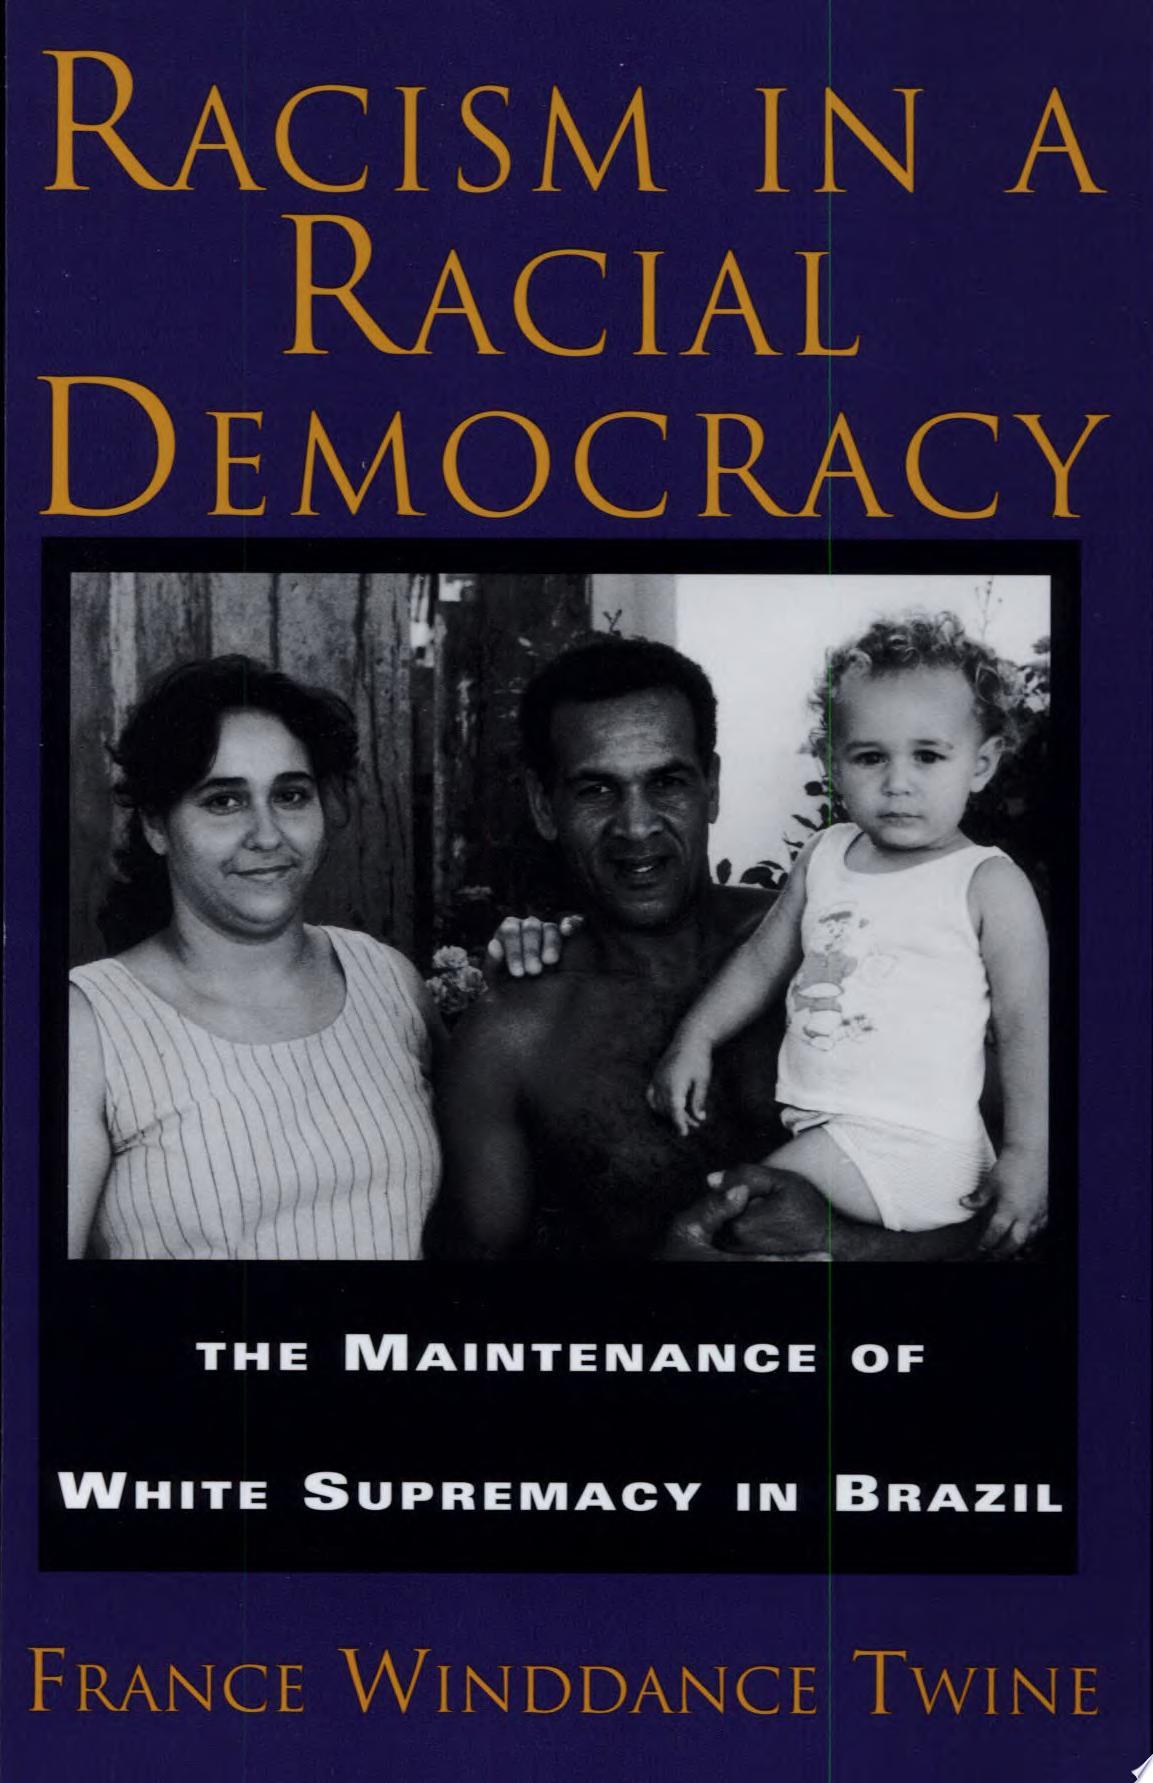 Racism in a Racial Democracy